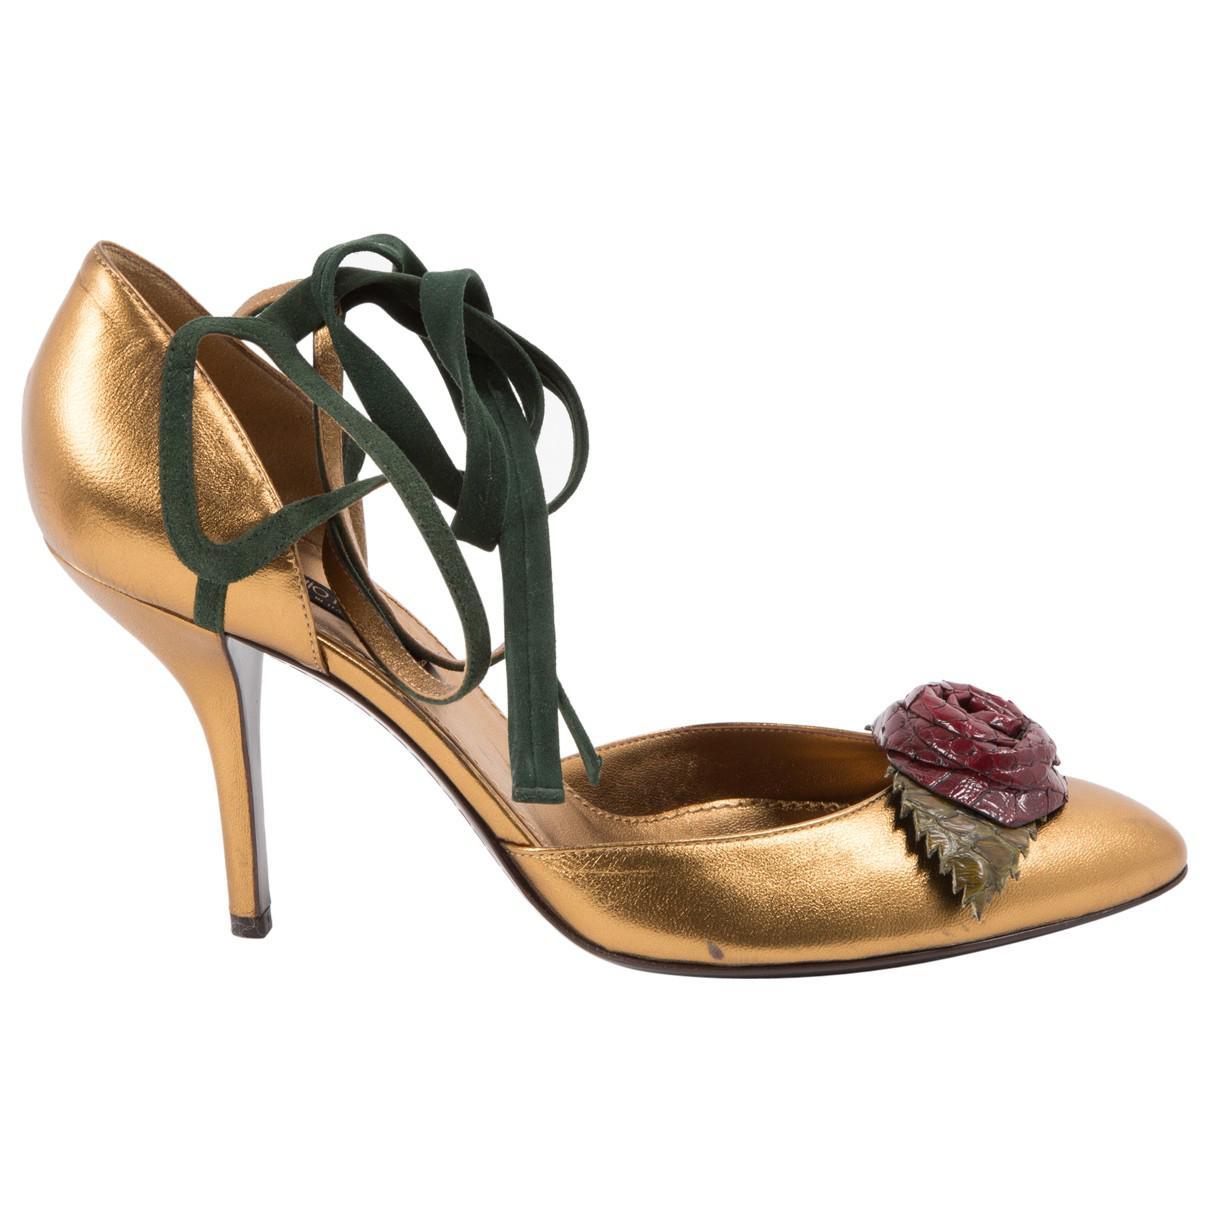 Pre-owned - Leather heels Sergio Rossi IEtjLrN